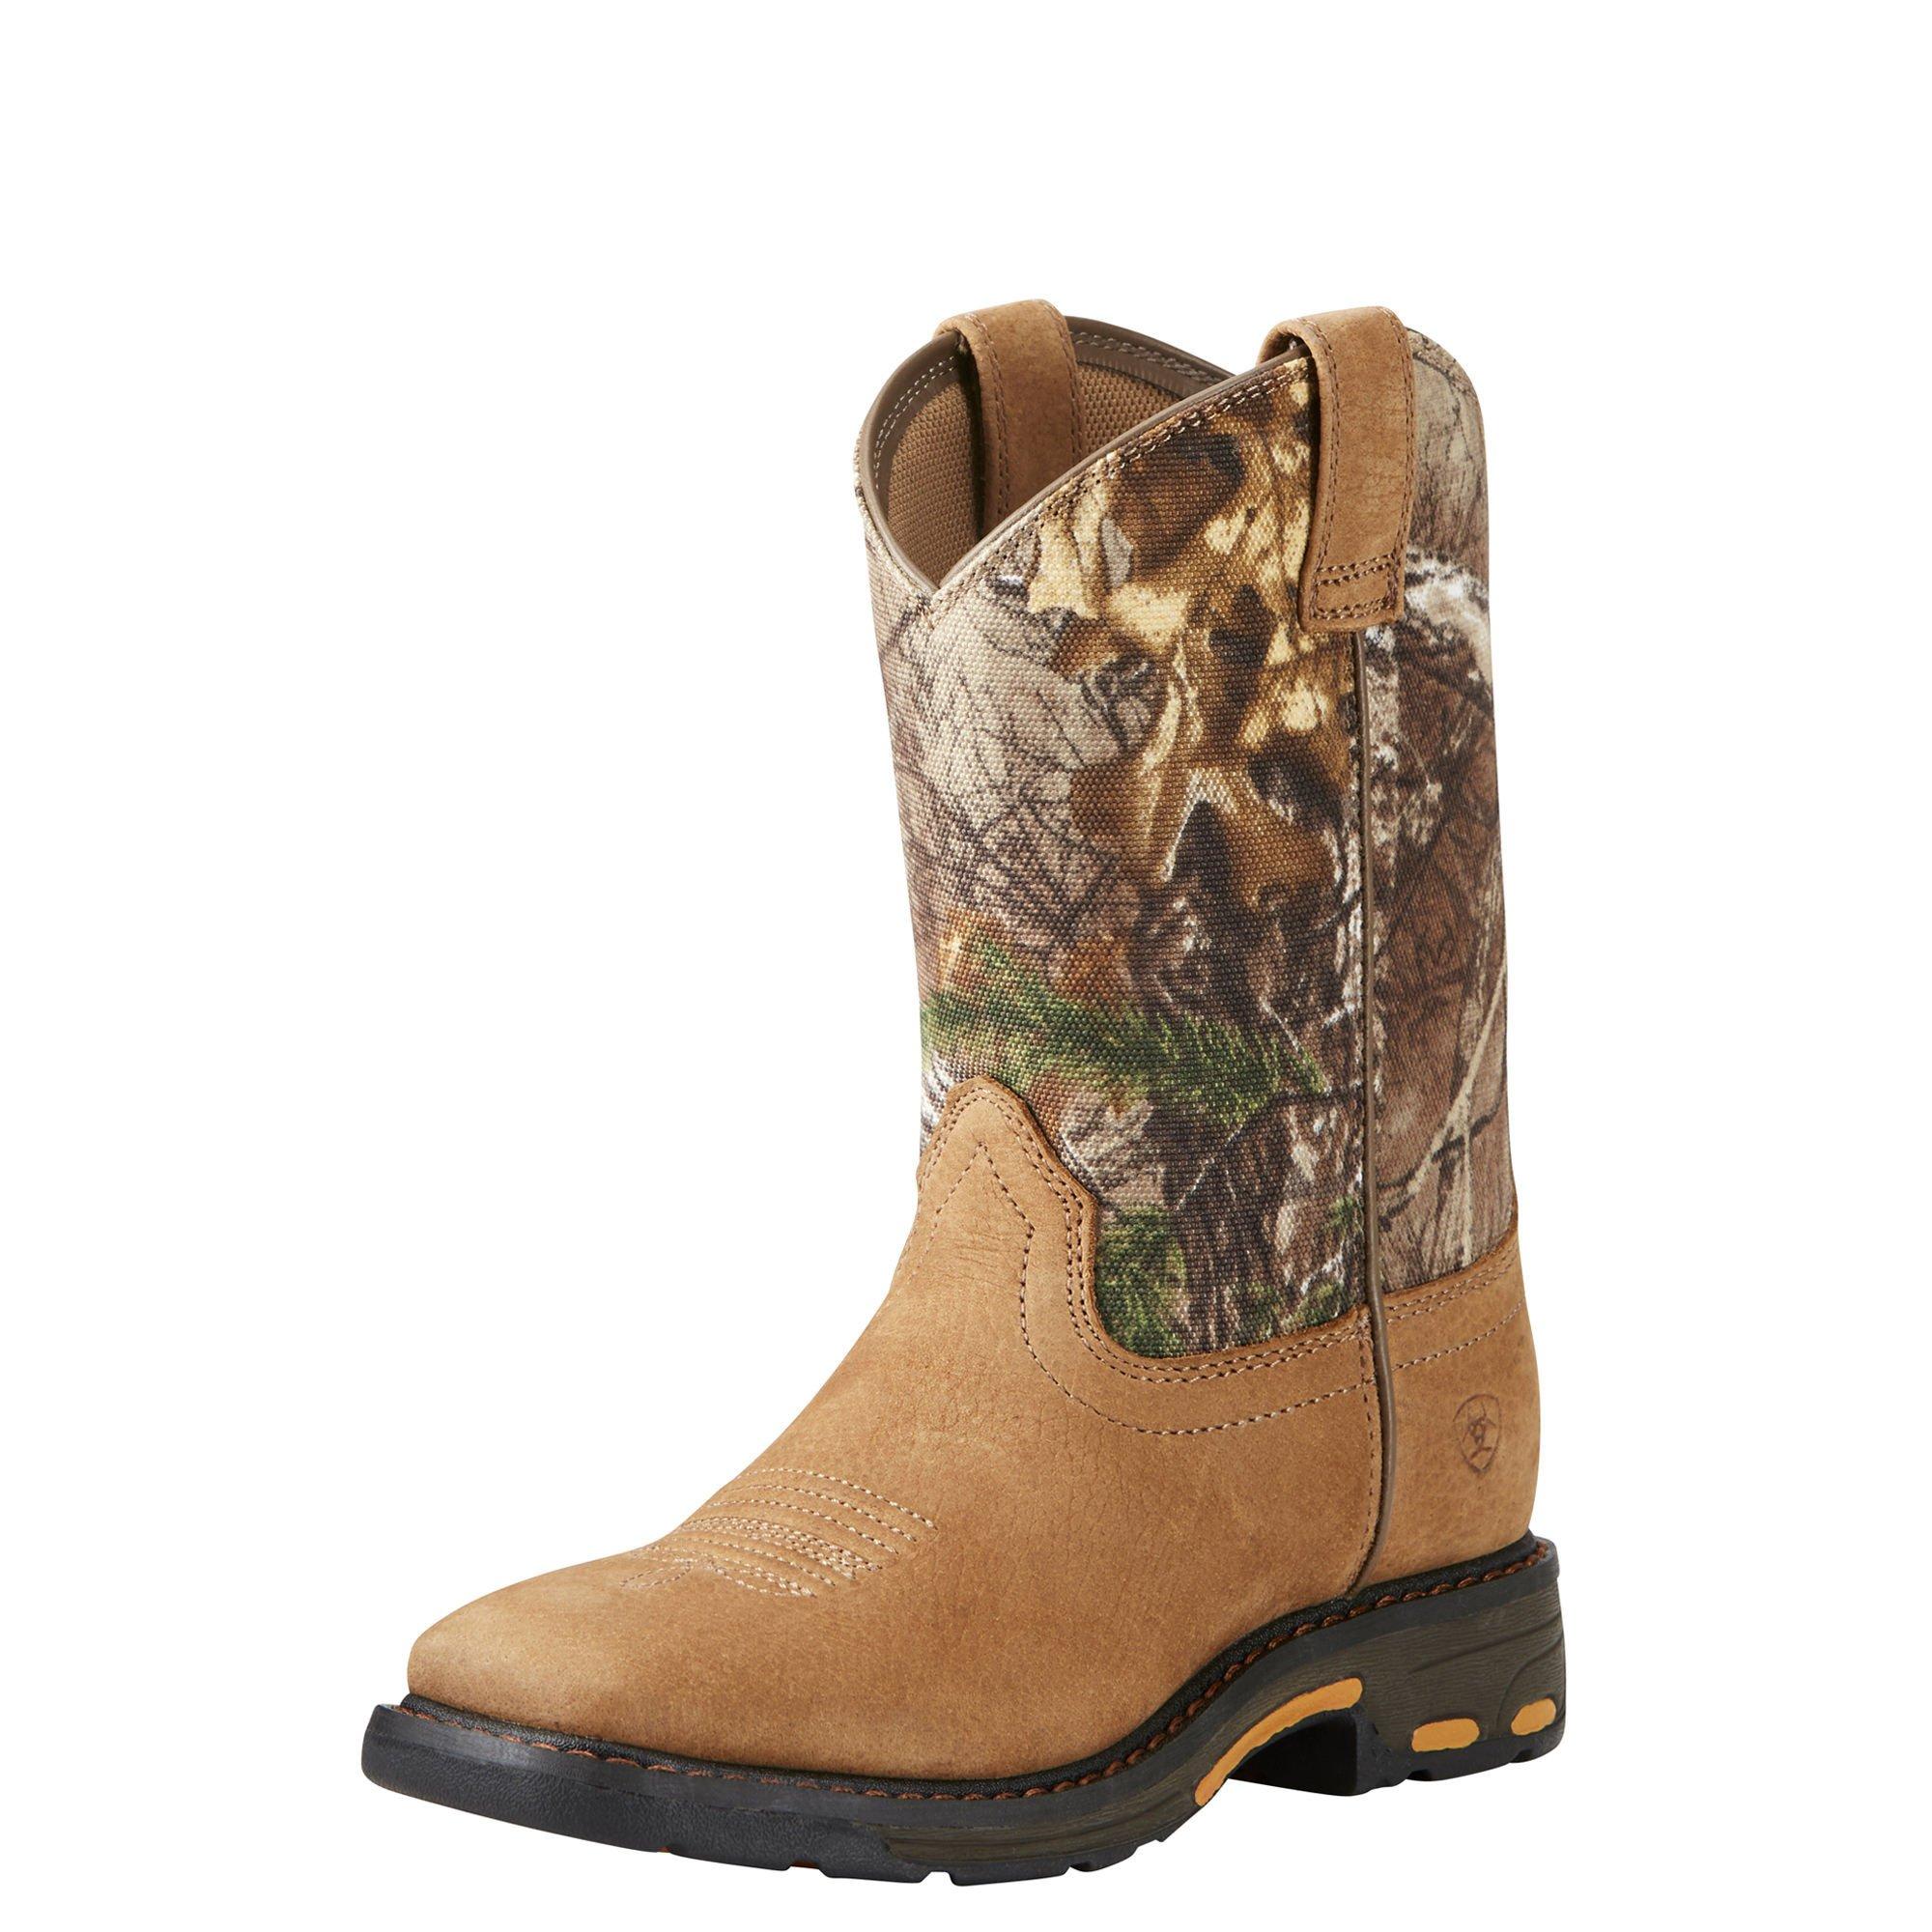 Kids' Workhog Wide Square Toe Western Cowboy Boot, Aged Bark, 3.5 M US Big Kid